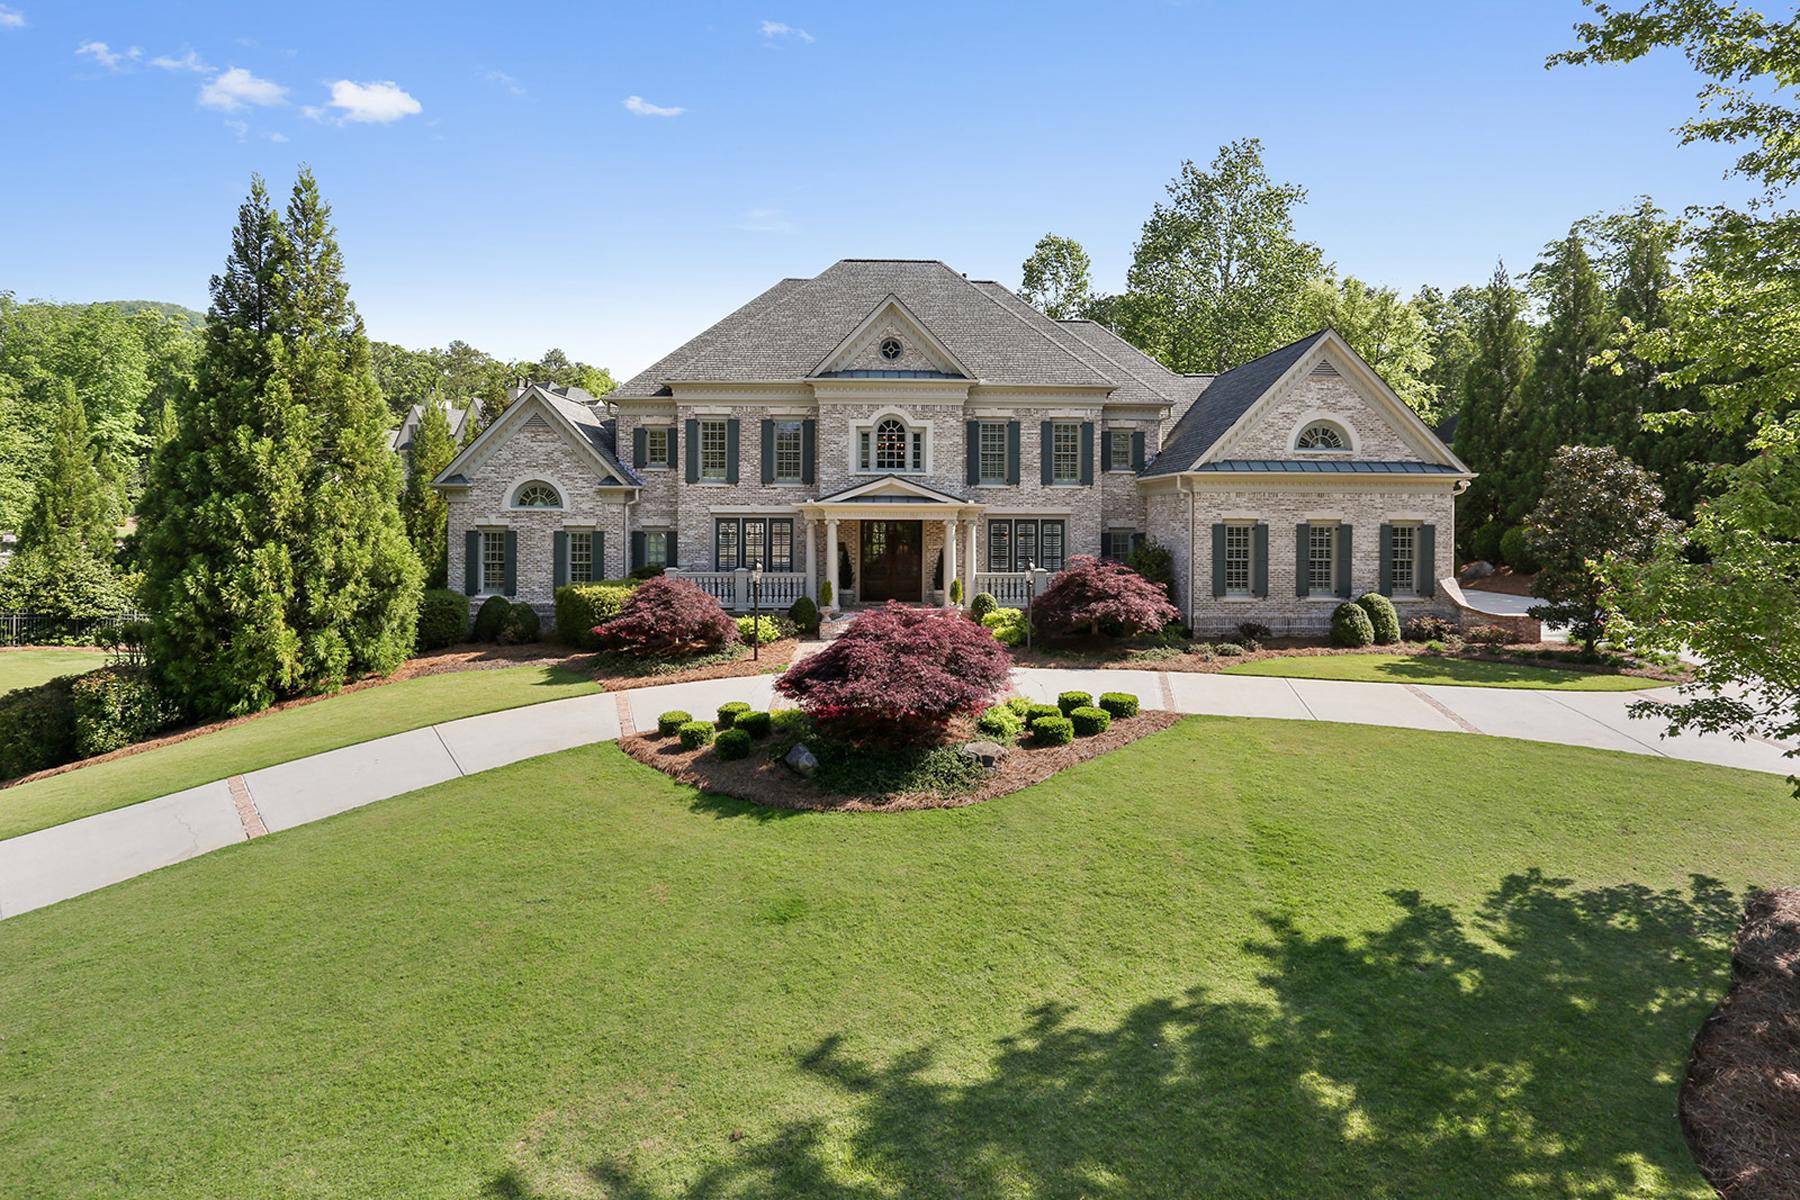 獨棟家庭住宅 為 出售 在 Stunning Georgian Styled Brick Home In Prestigious Anderson Farm 508 Kent Terrace Marietta, 喬治亞州, 30064 美國